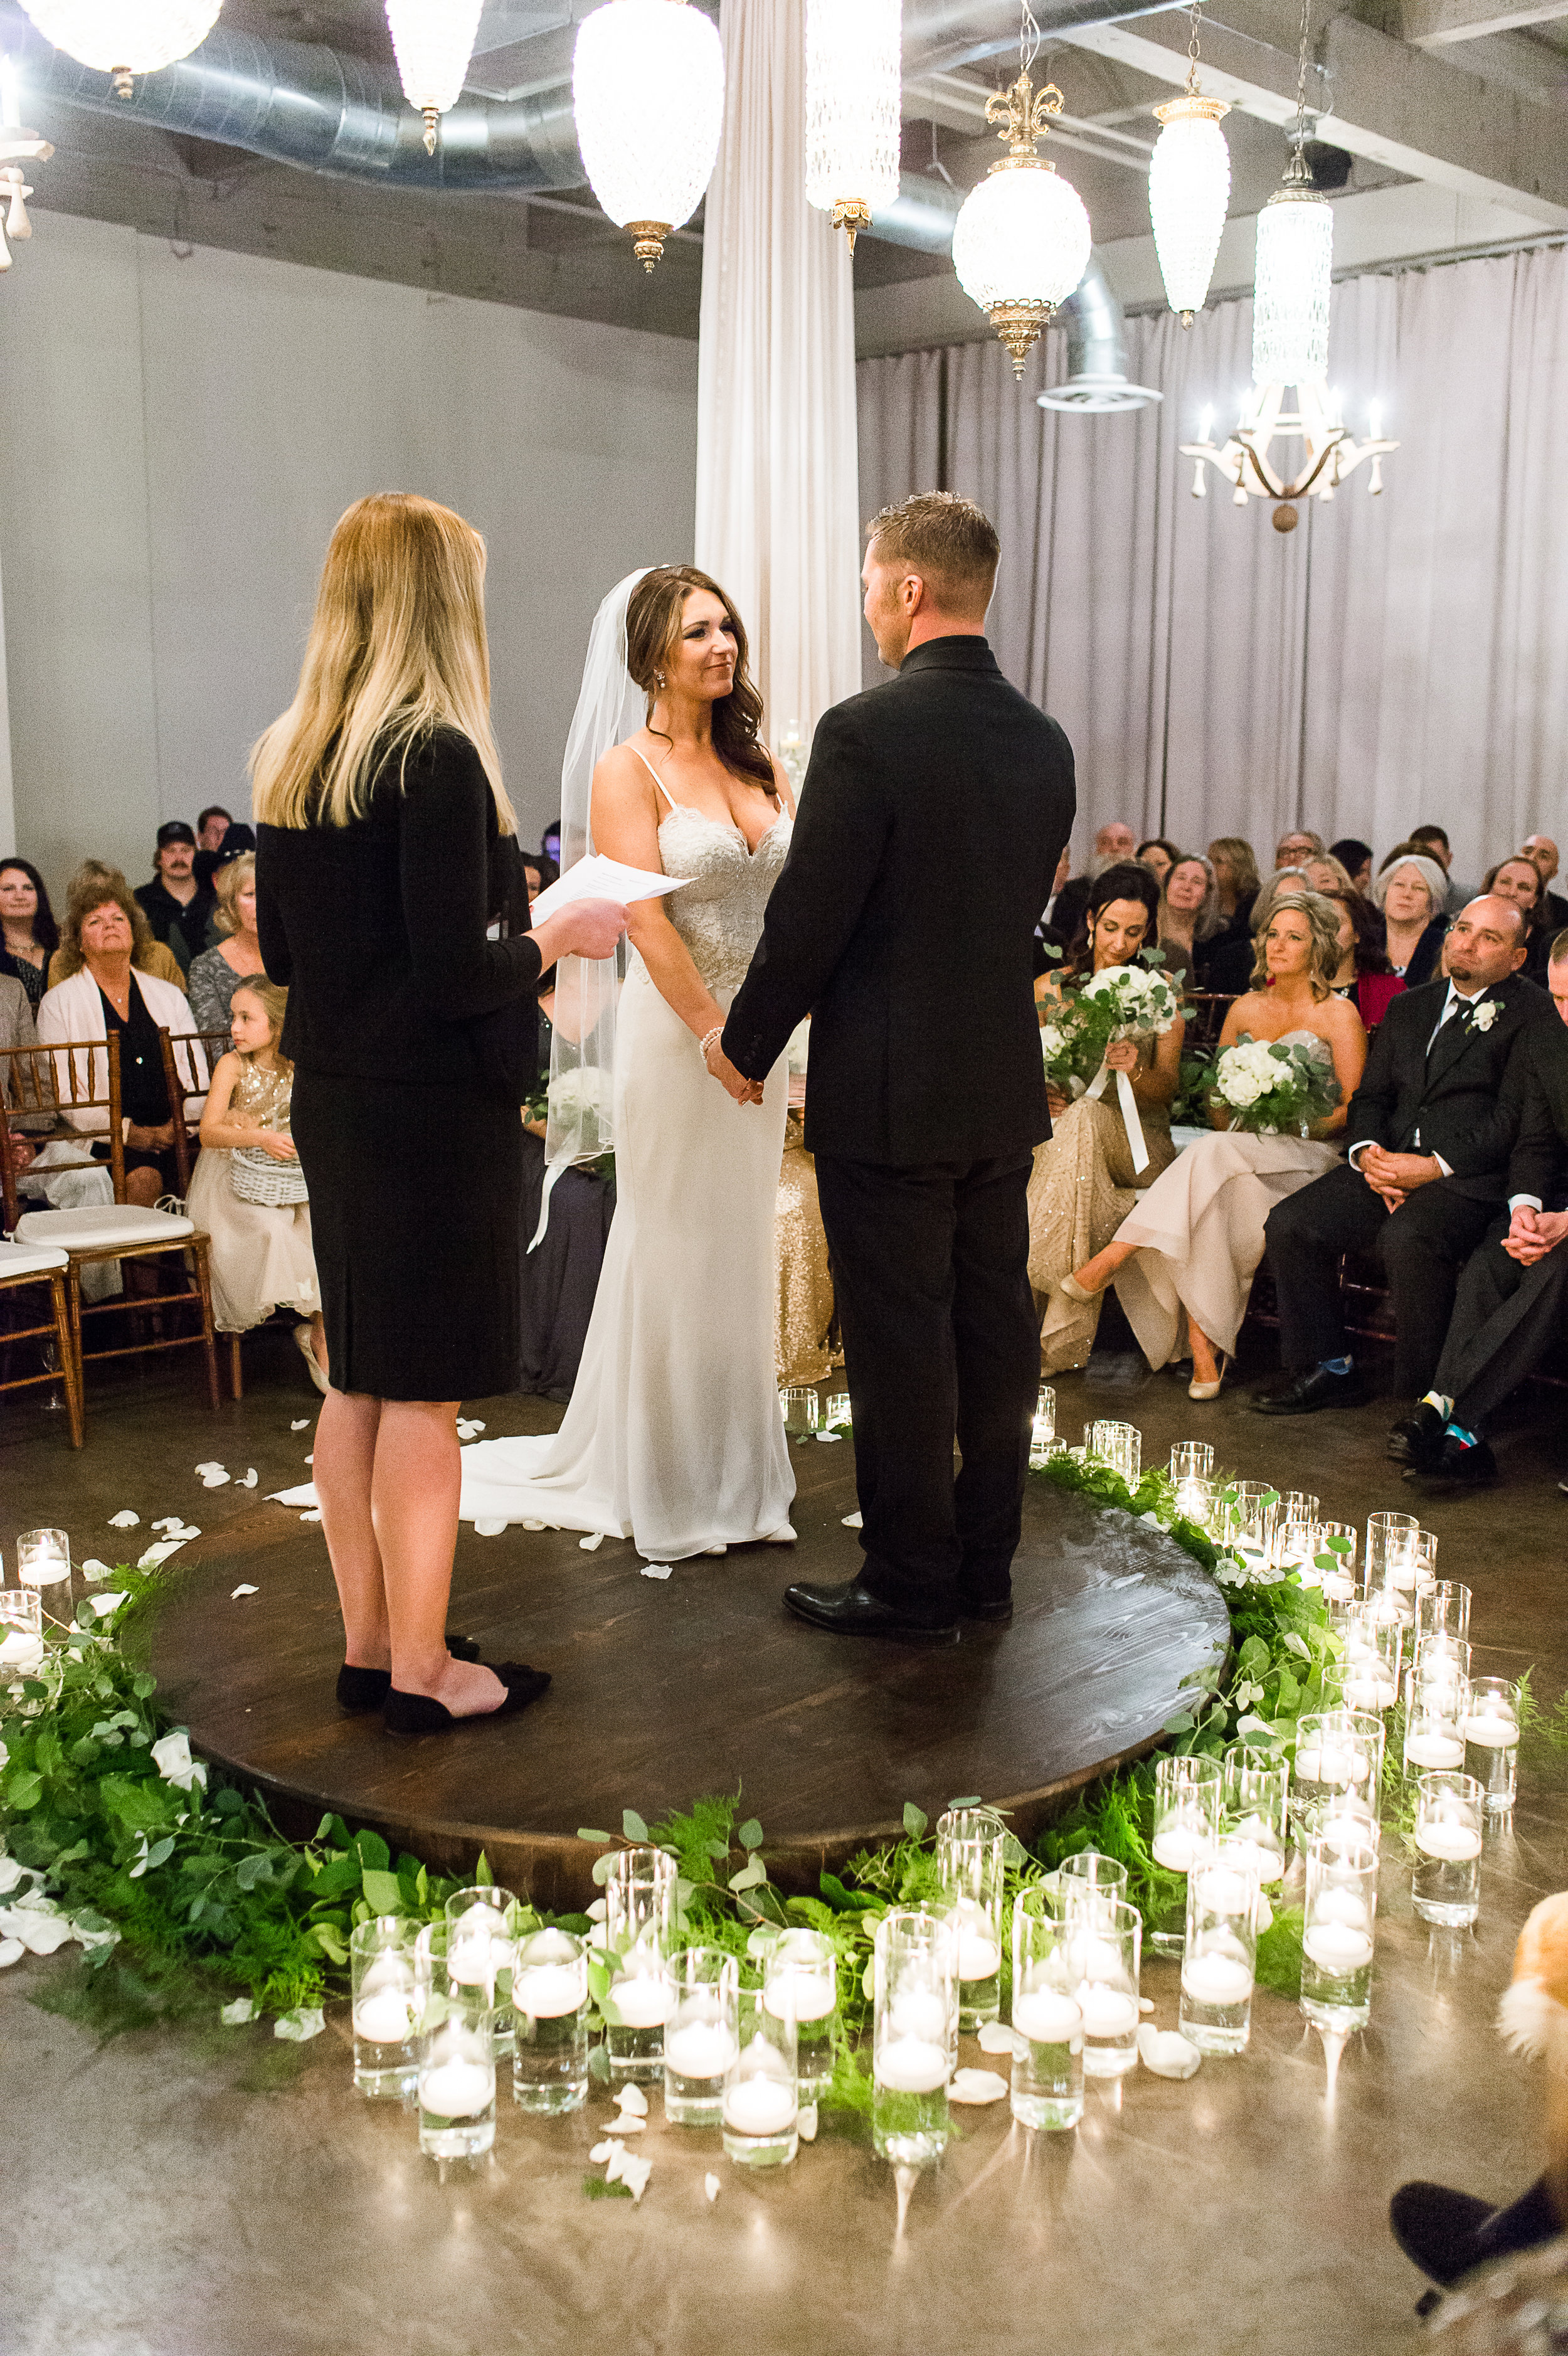 JJ-wedding-Van-Wyhe-Photography-368.jpg